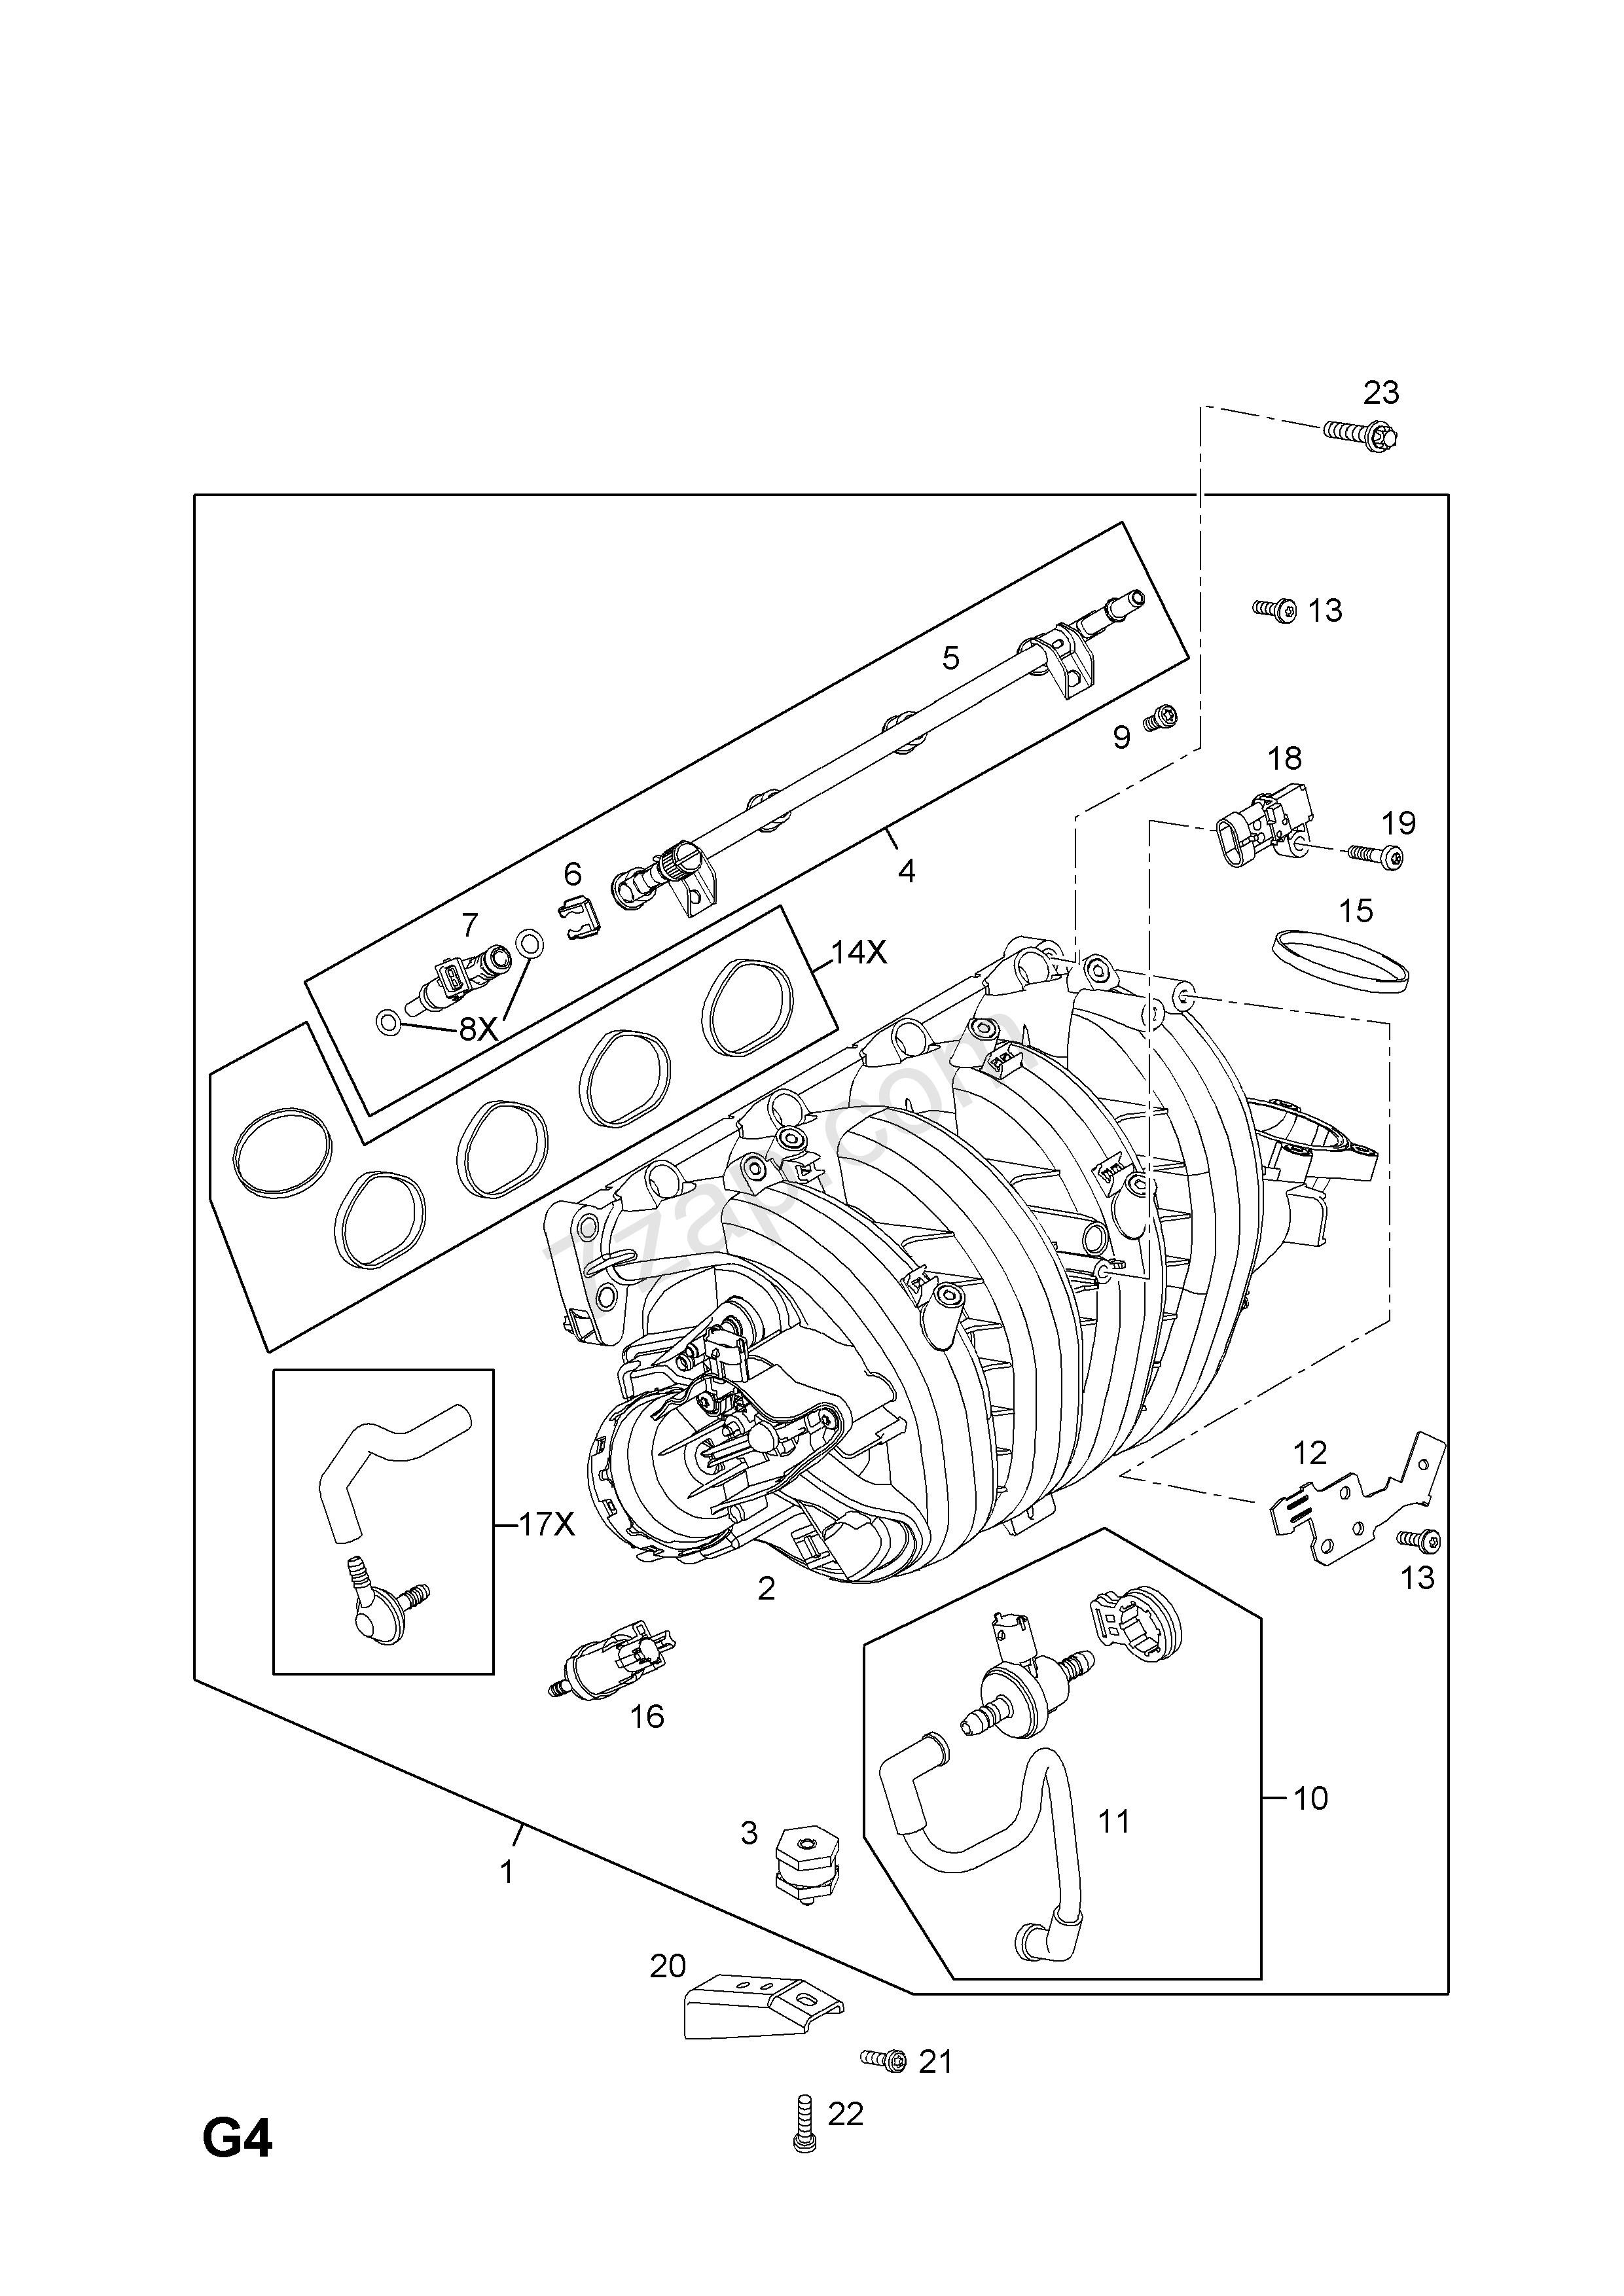 Vauxhall Corsa B Wiring Diagram